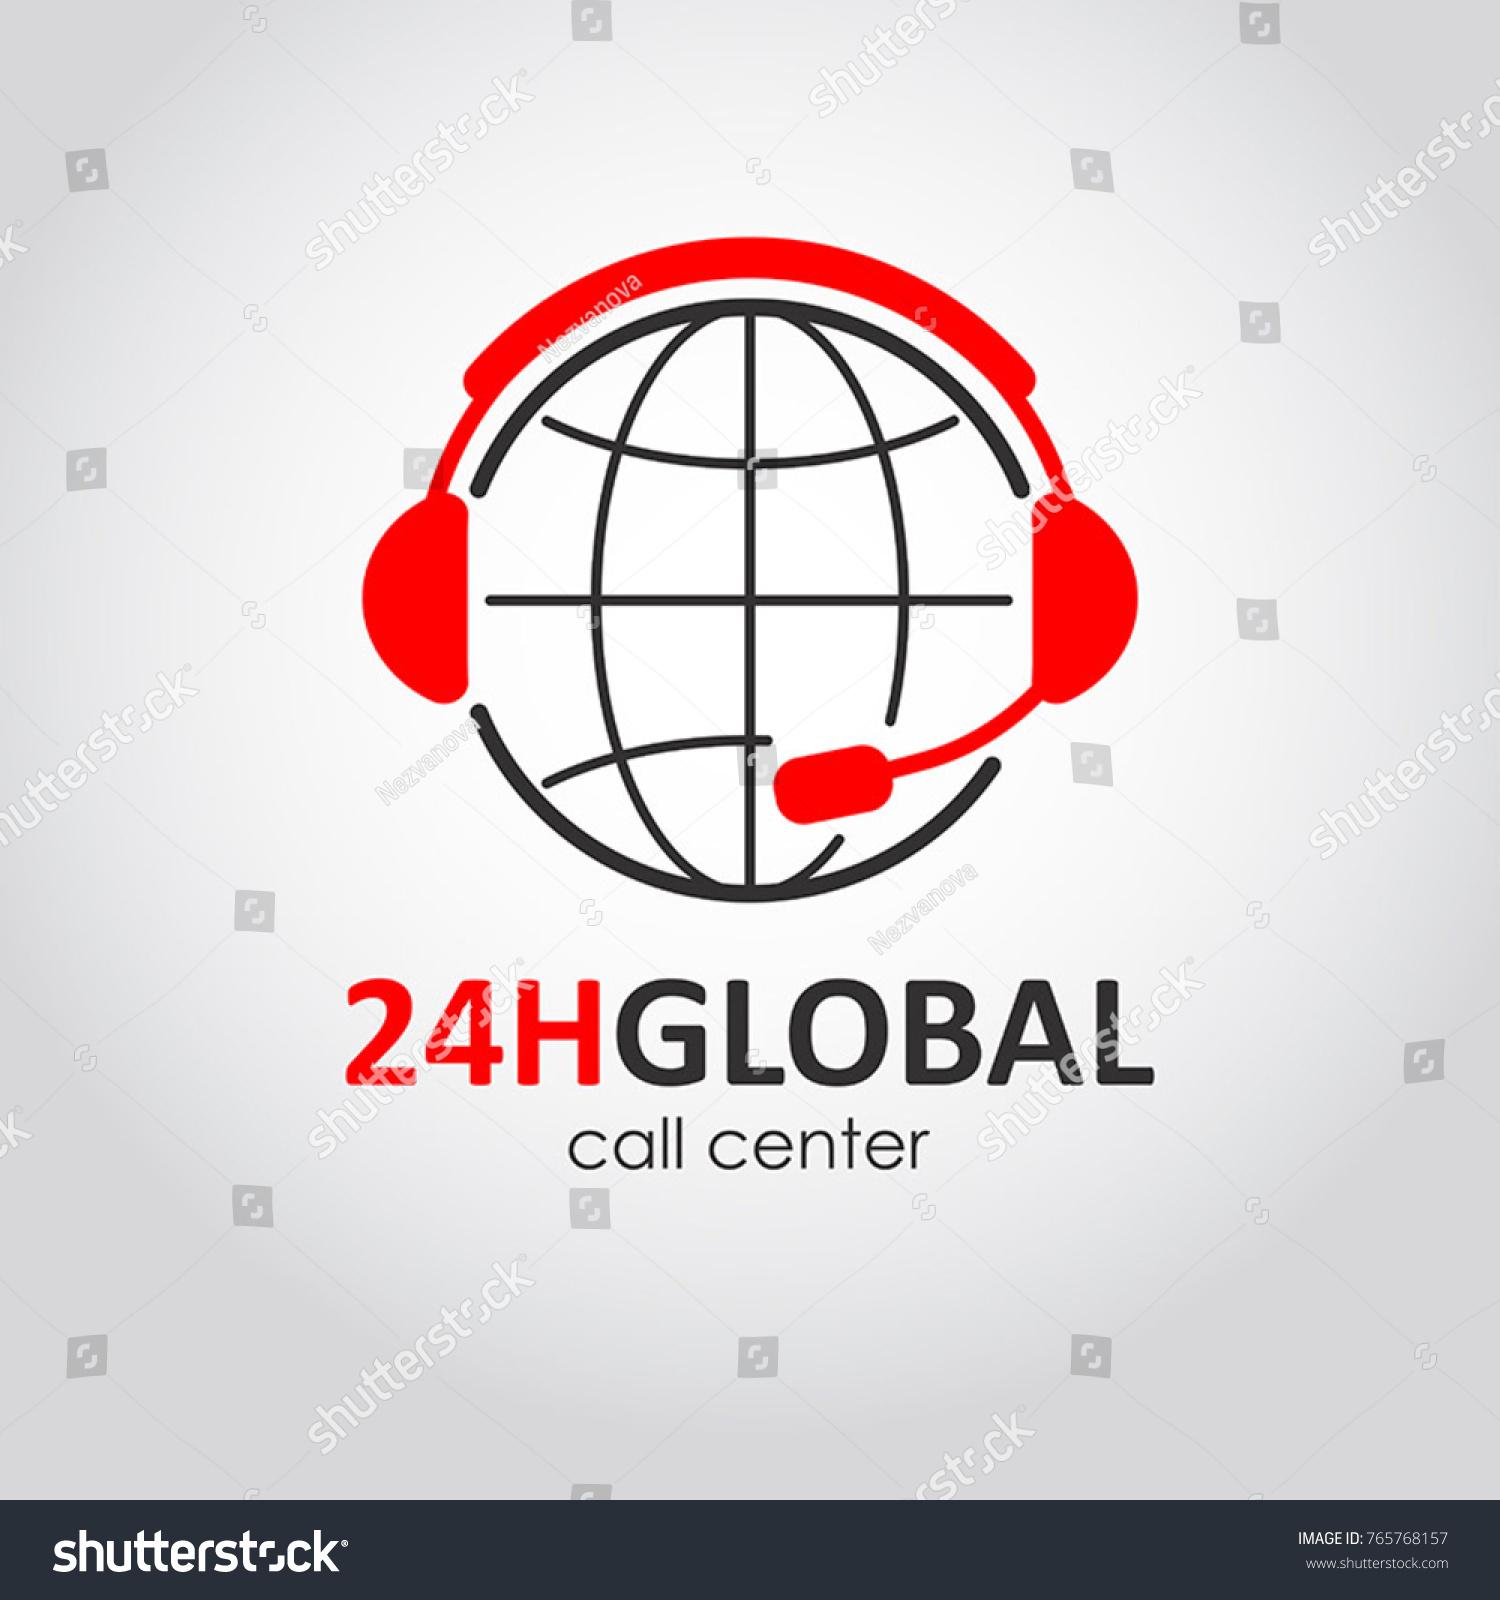 Global Call Center Flat Style Logo Stock-Vektorgrafik (Lizenzfrei ...